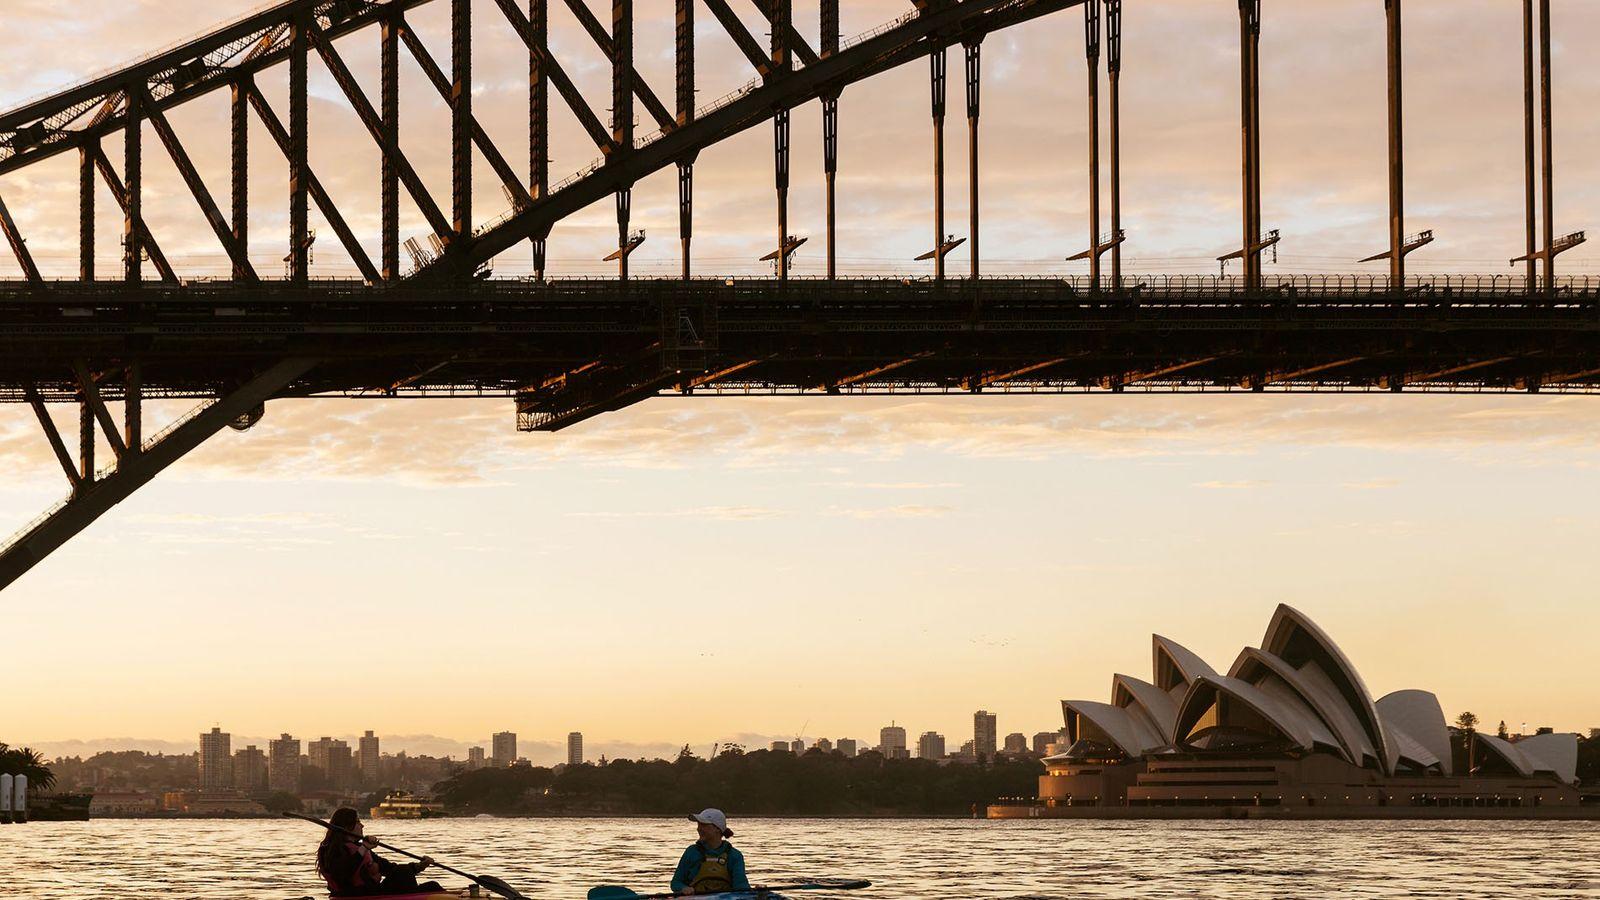 Kayaking beneath the Sydney Harbour Bridge at dawn